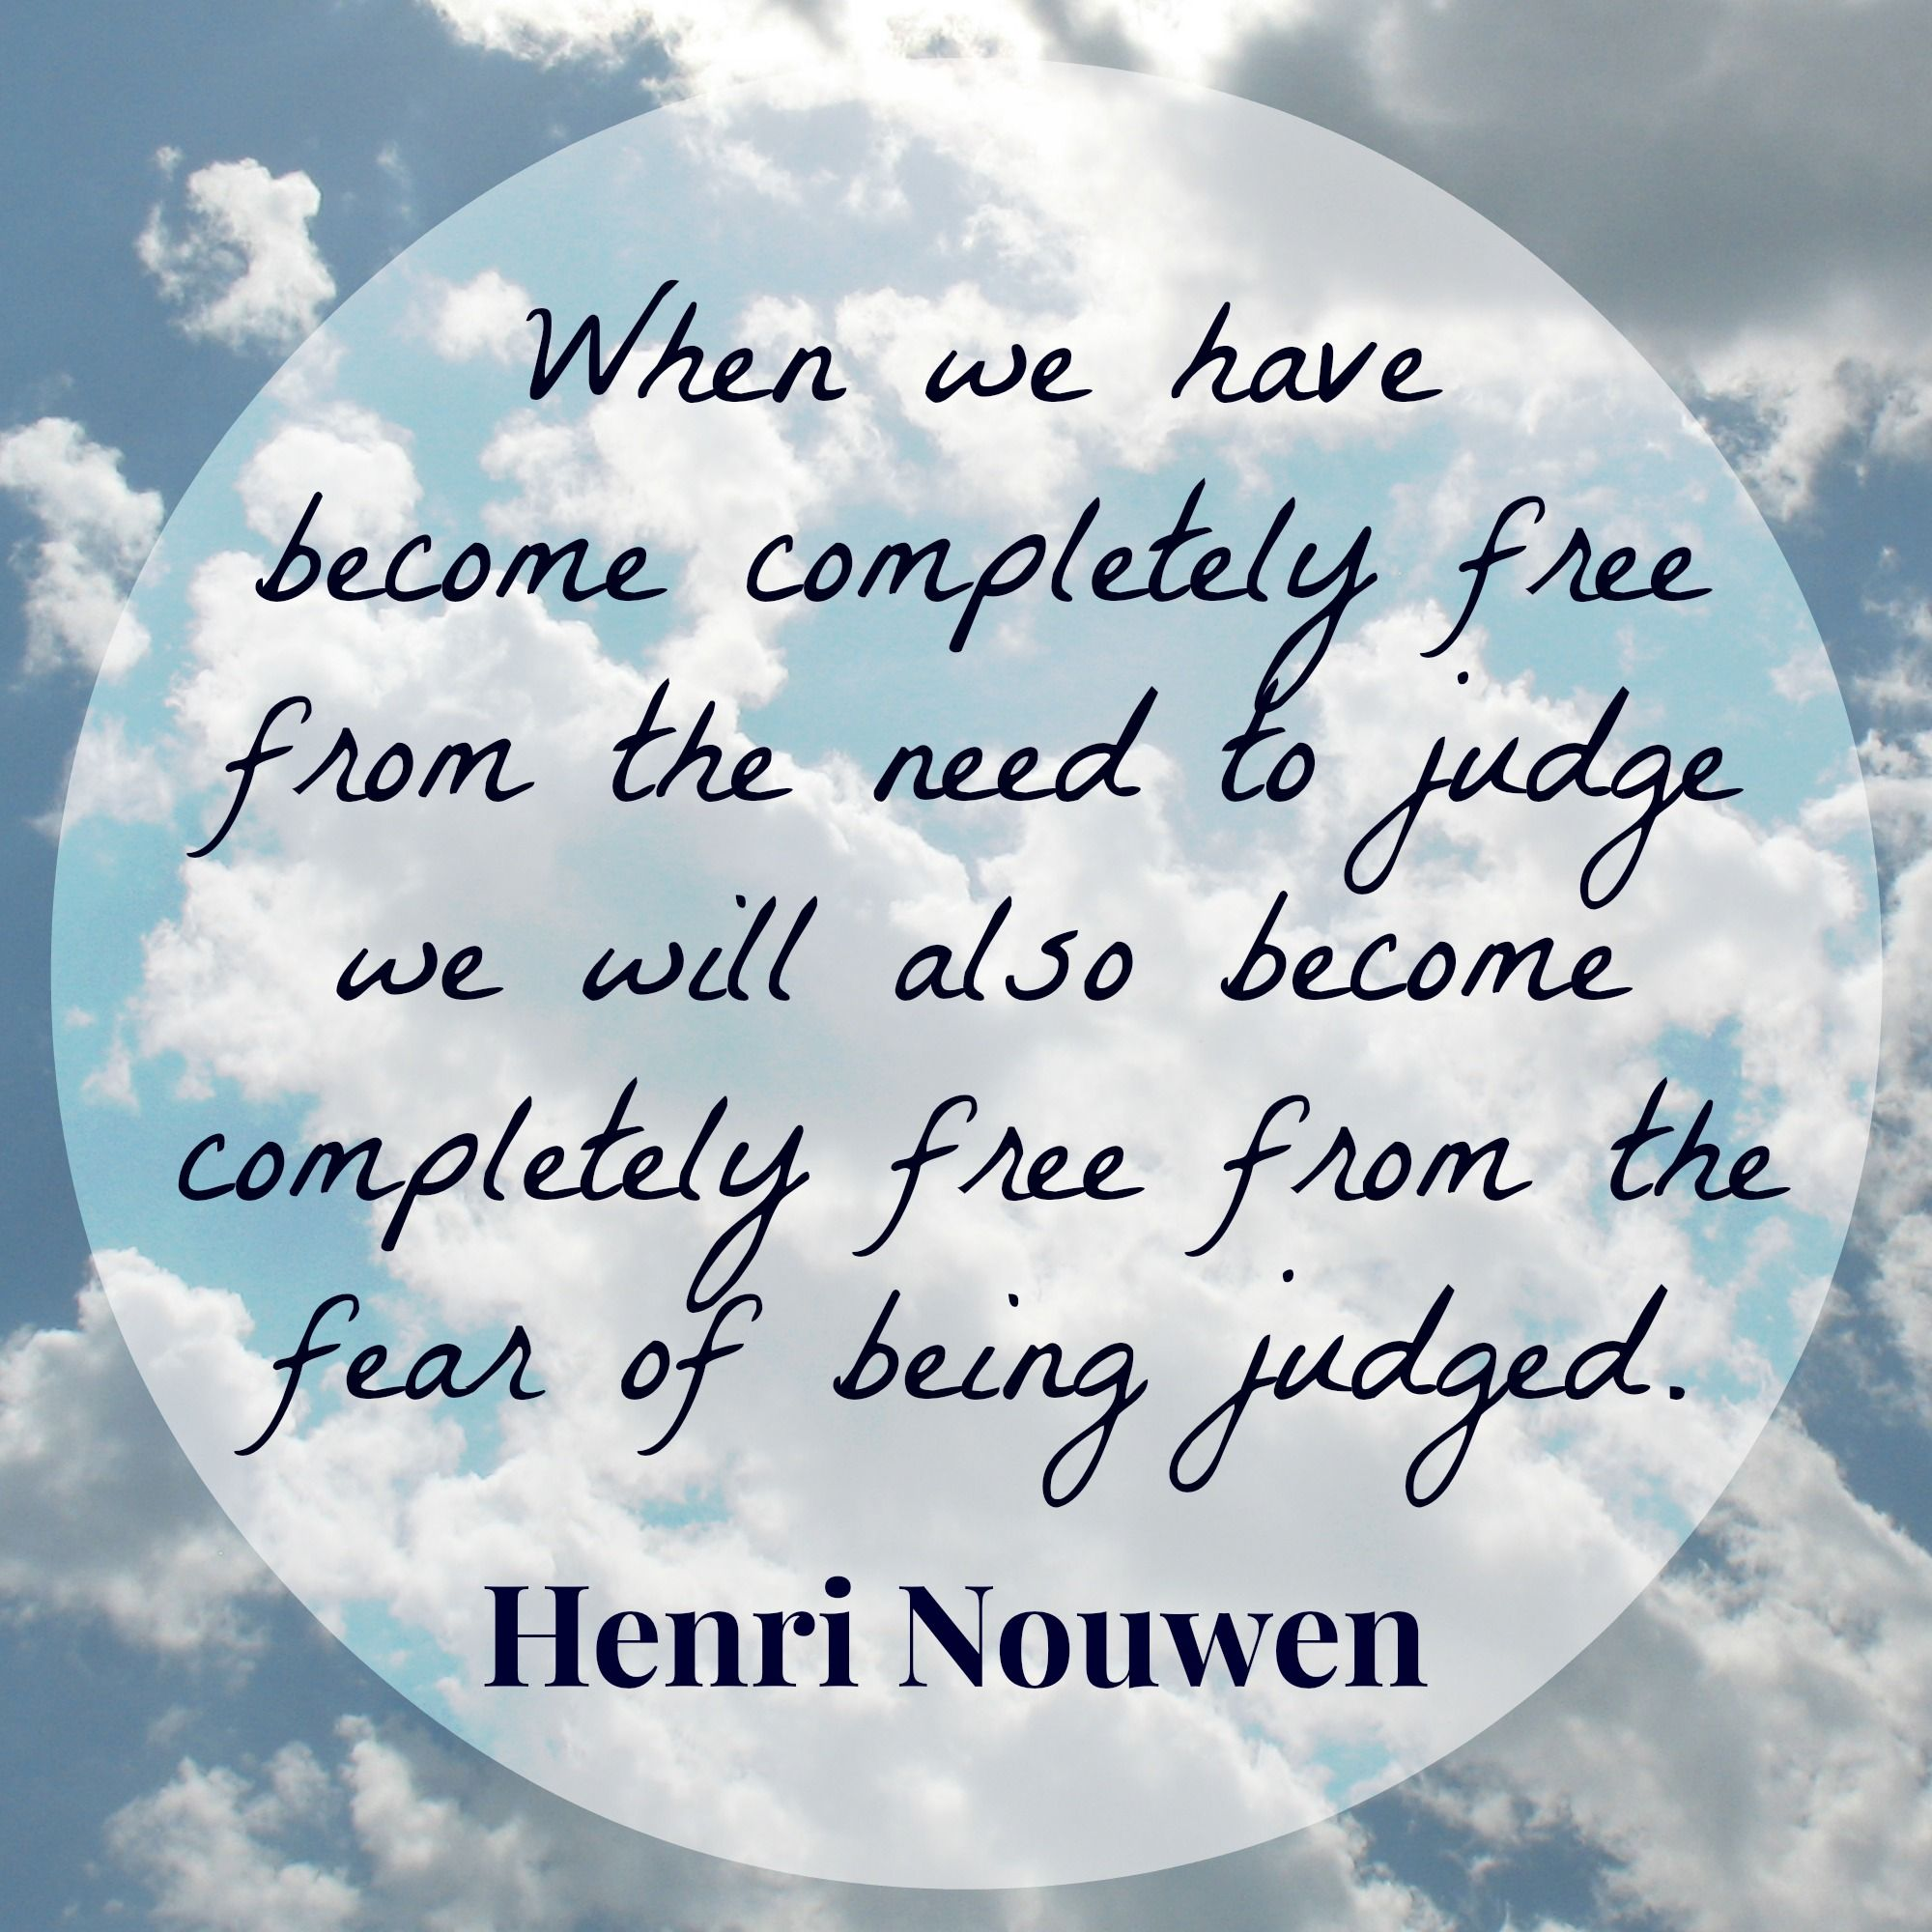 Quotable // from Henri Nouwen | Beloved quotes, Henri nouwen ...